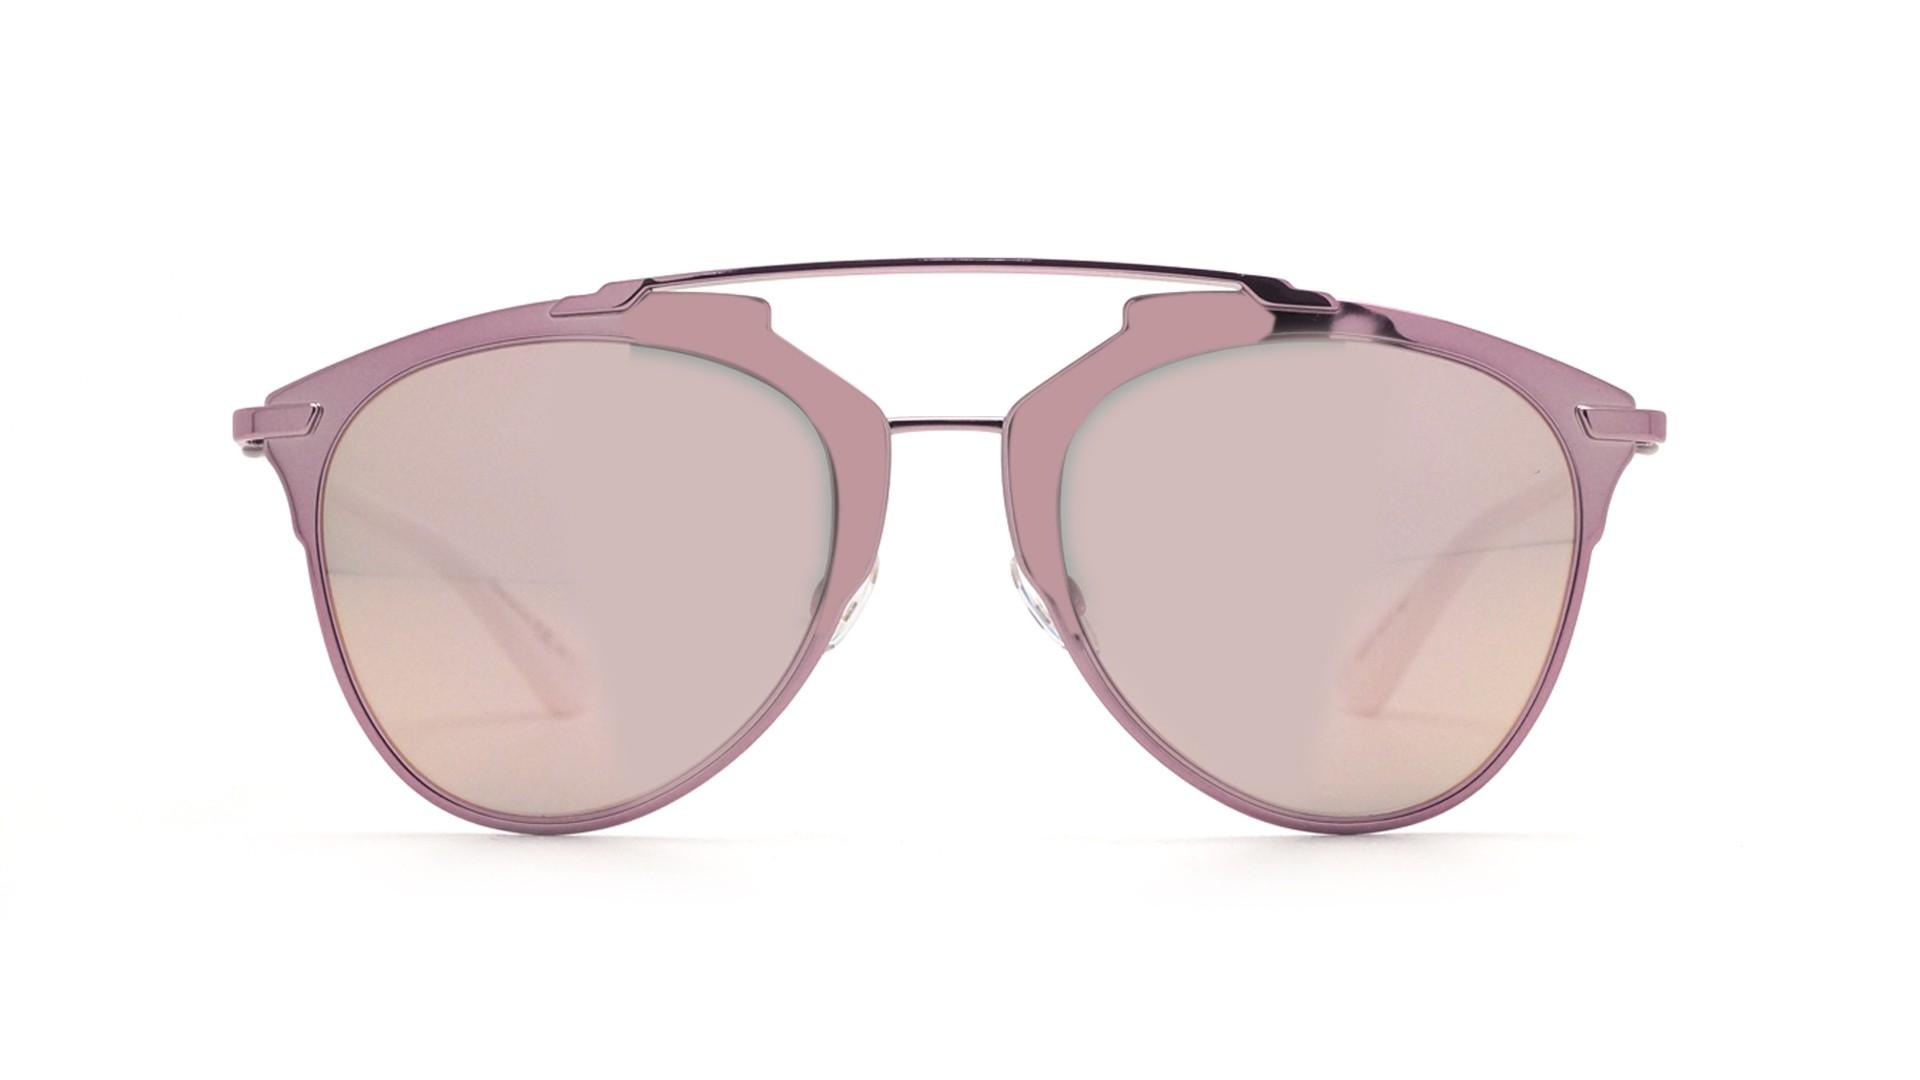 126d9a382d Lunettes de soleil Dior Reflected Pink white Rose DIORREFLECTED M2Q0J 52-21  Medium Miroirs